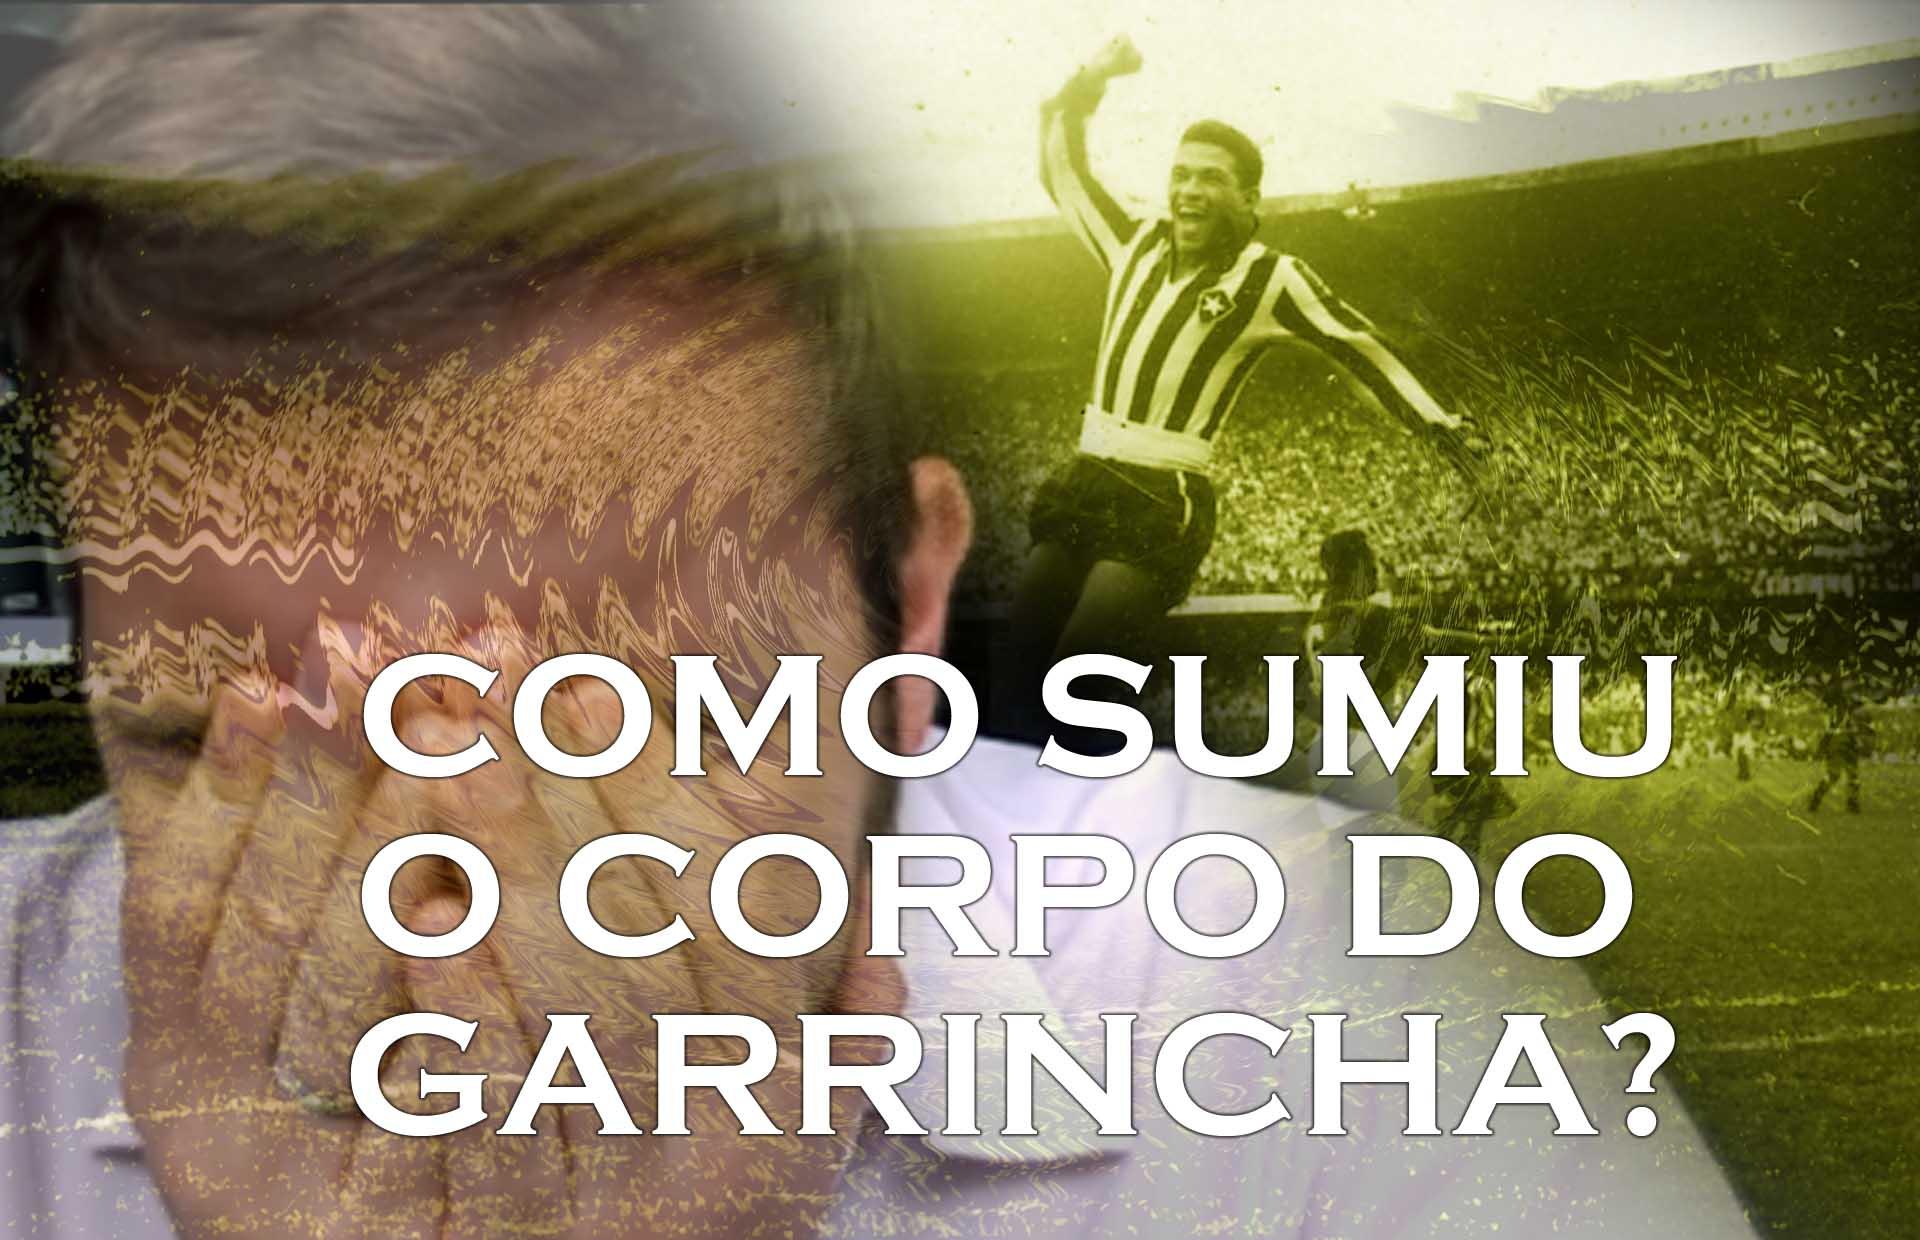 Sumiu o corpo do Garrincha